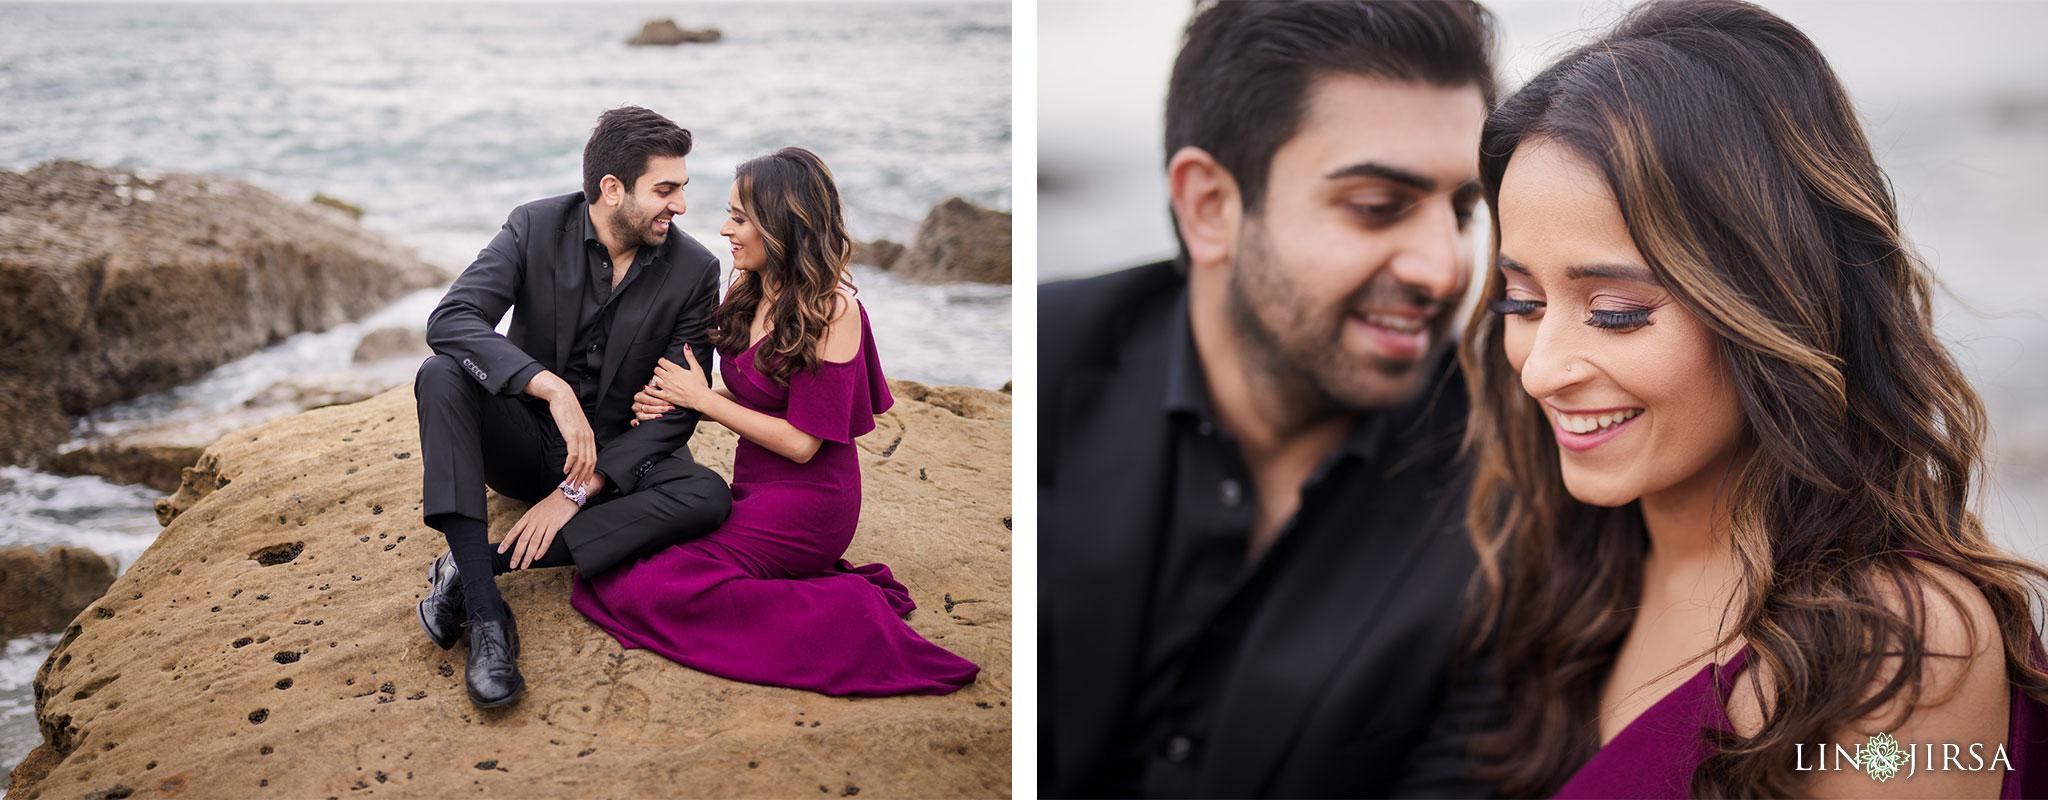 07 Laguna Beach Orange County Engagement Photography 1